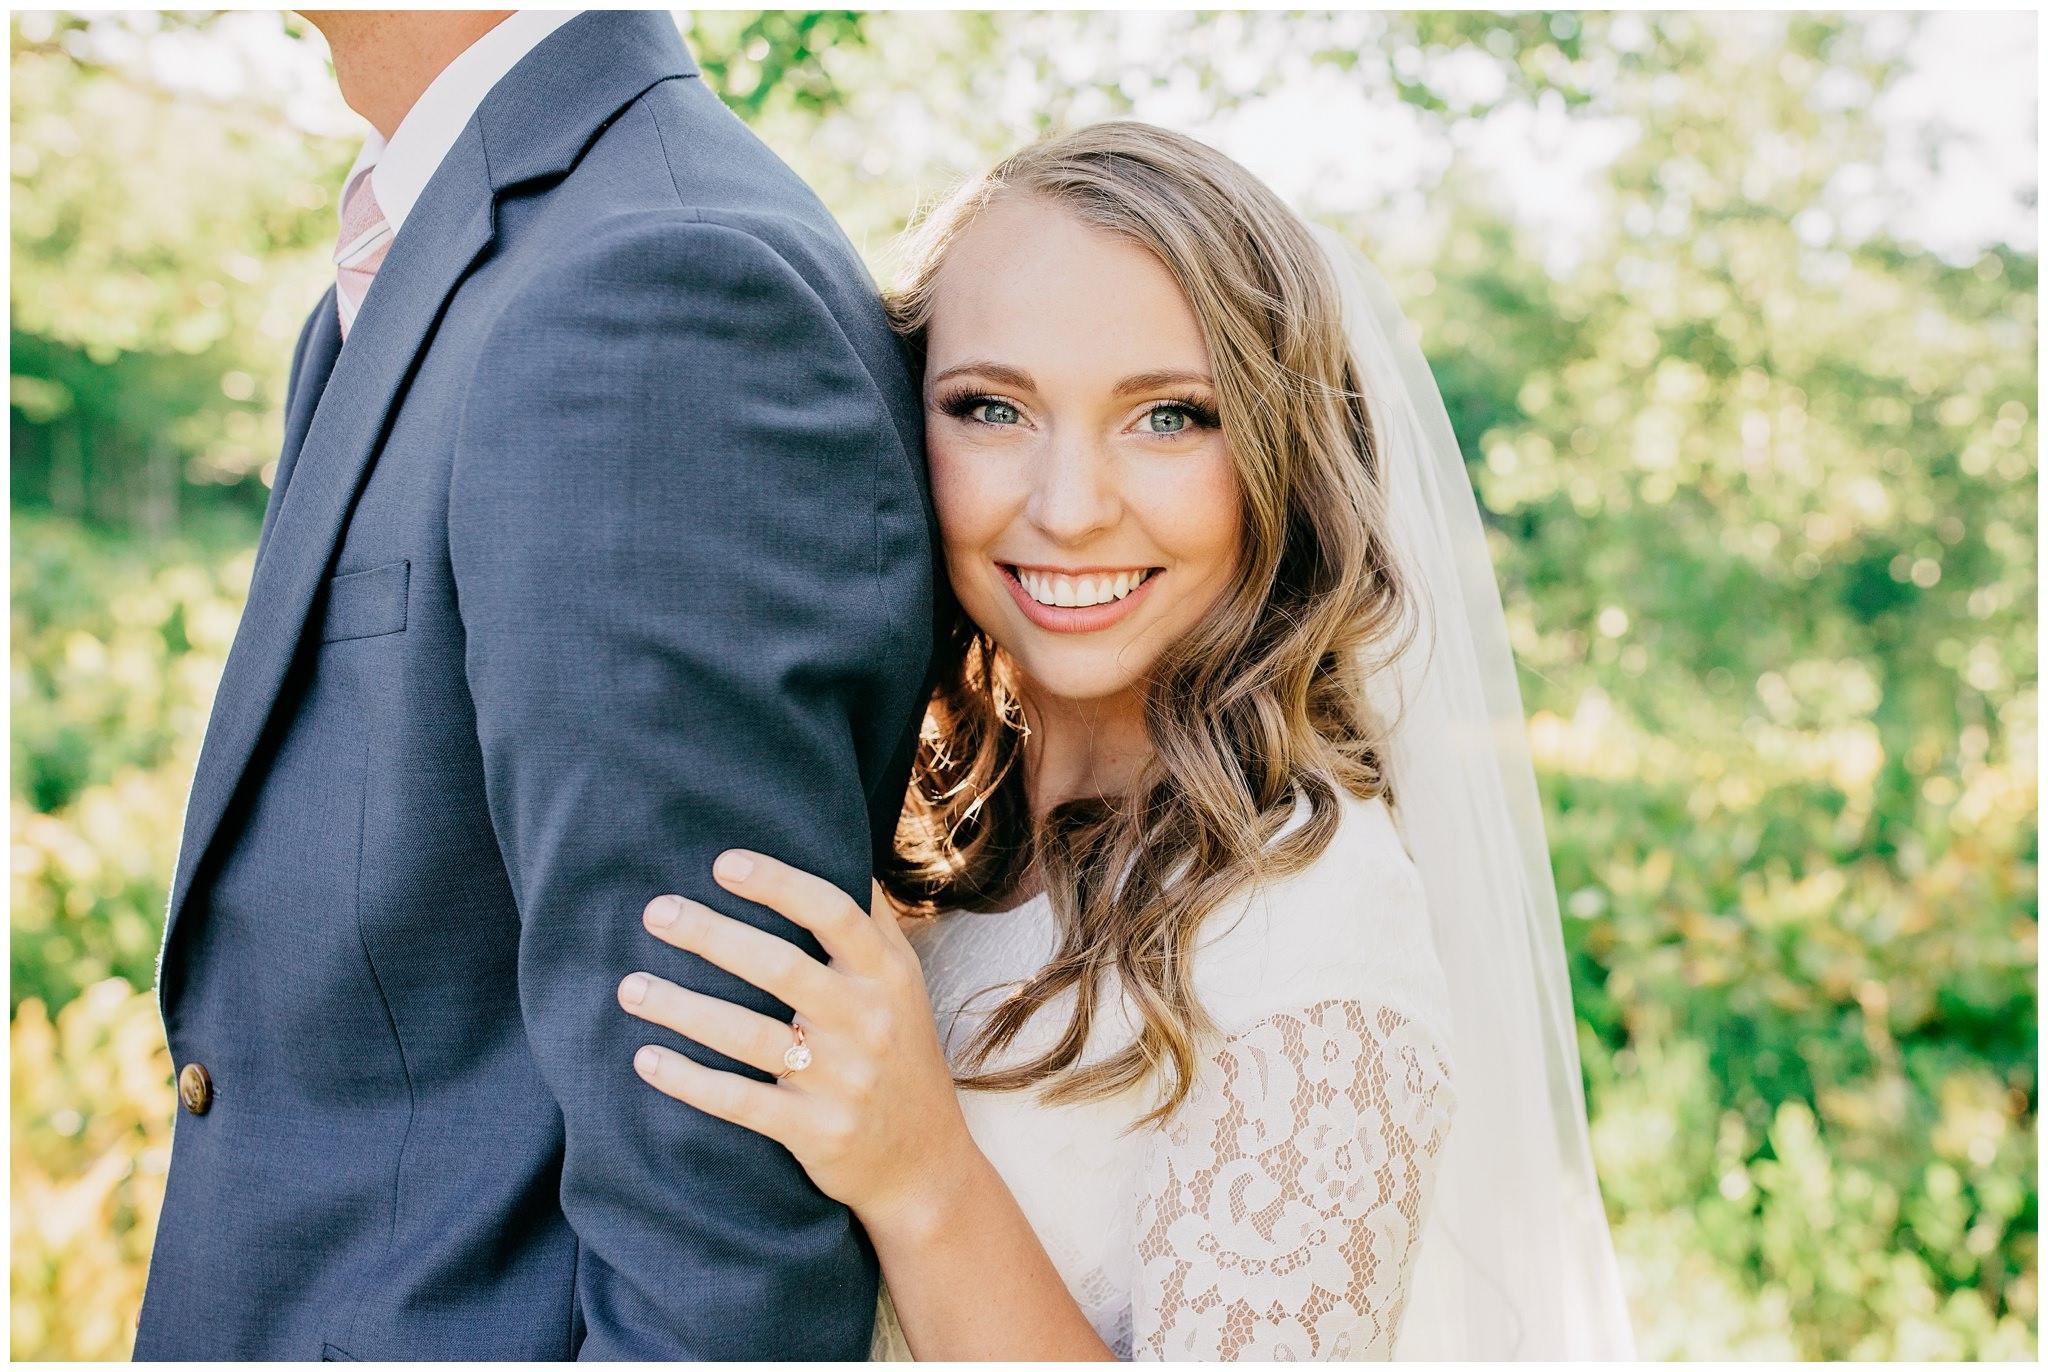 Aspen tree bridals and wedding photos